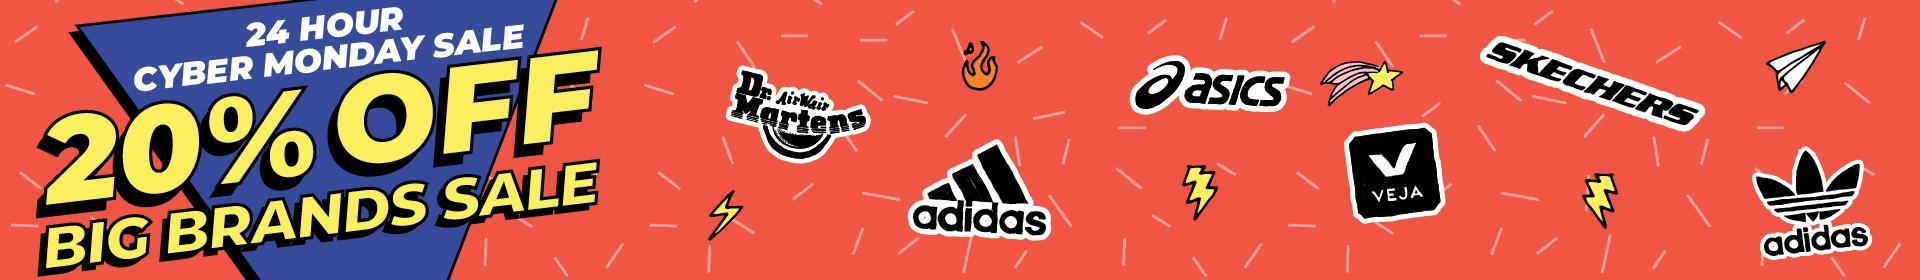 20% Off Big Brand Cyber Sale | adidas added shop now